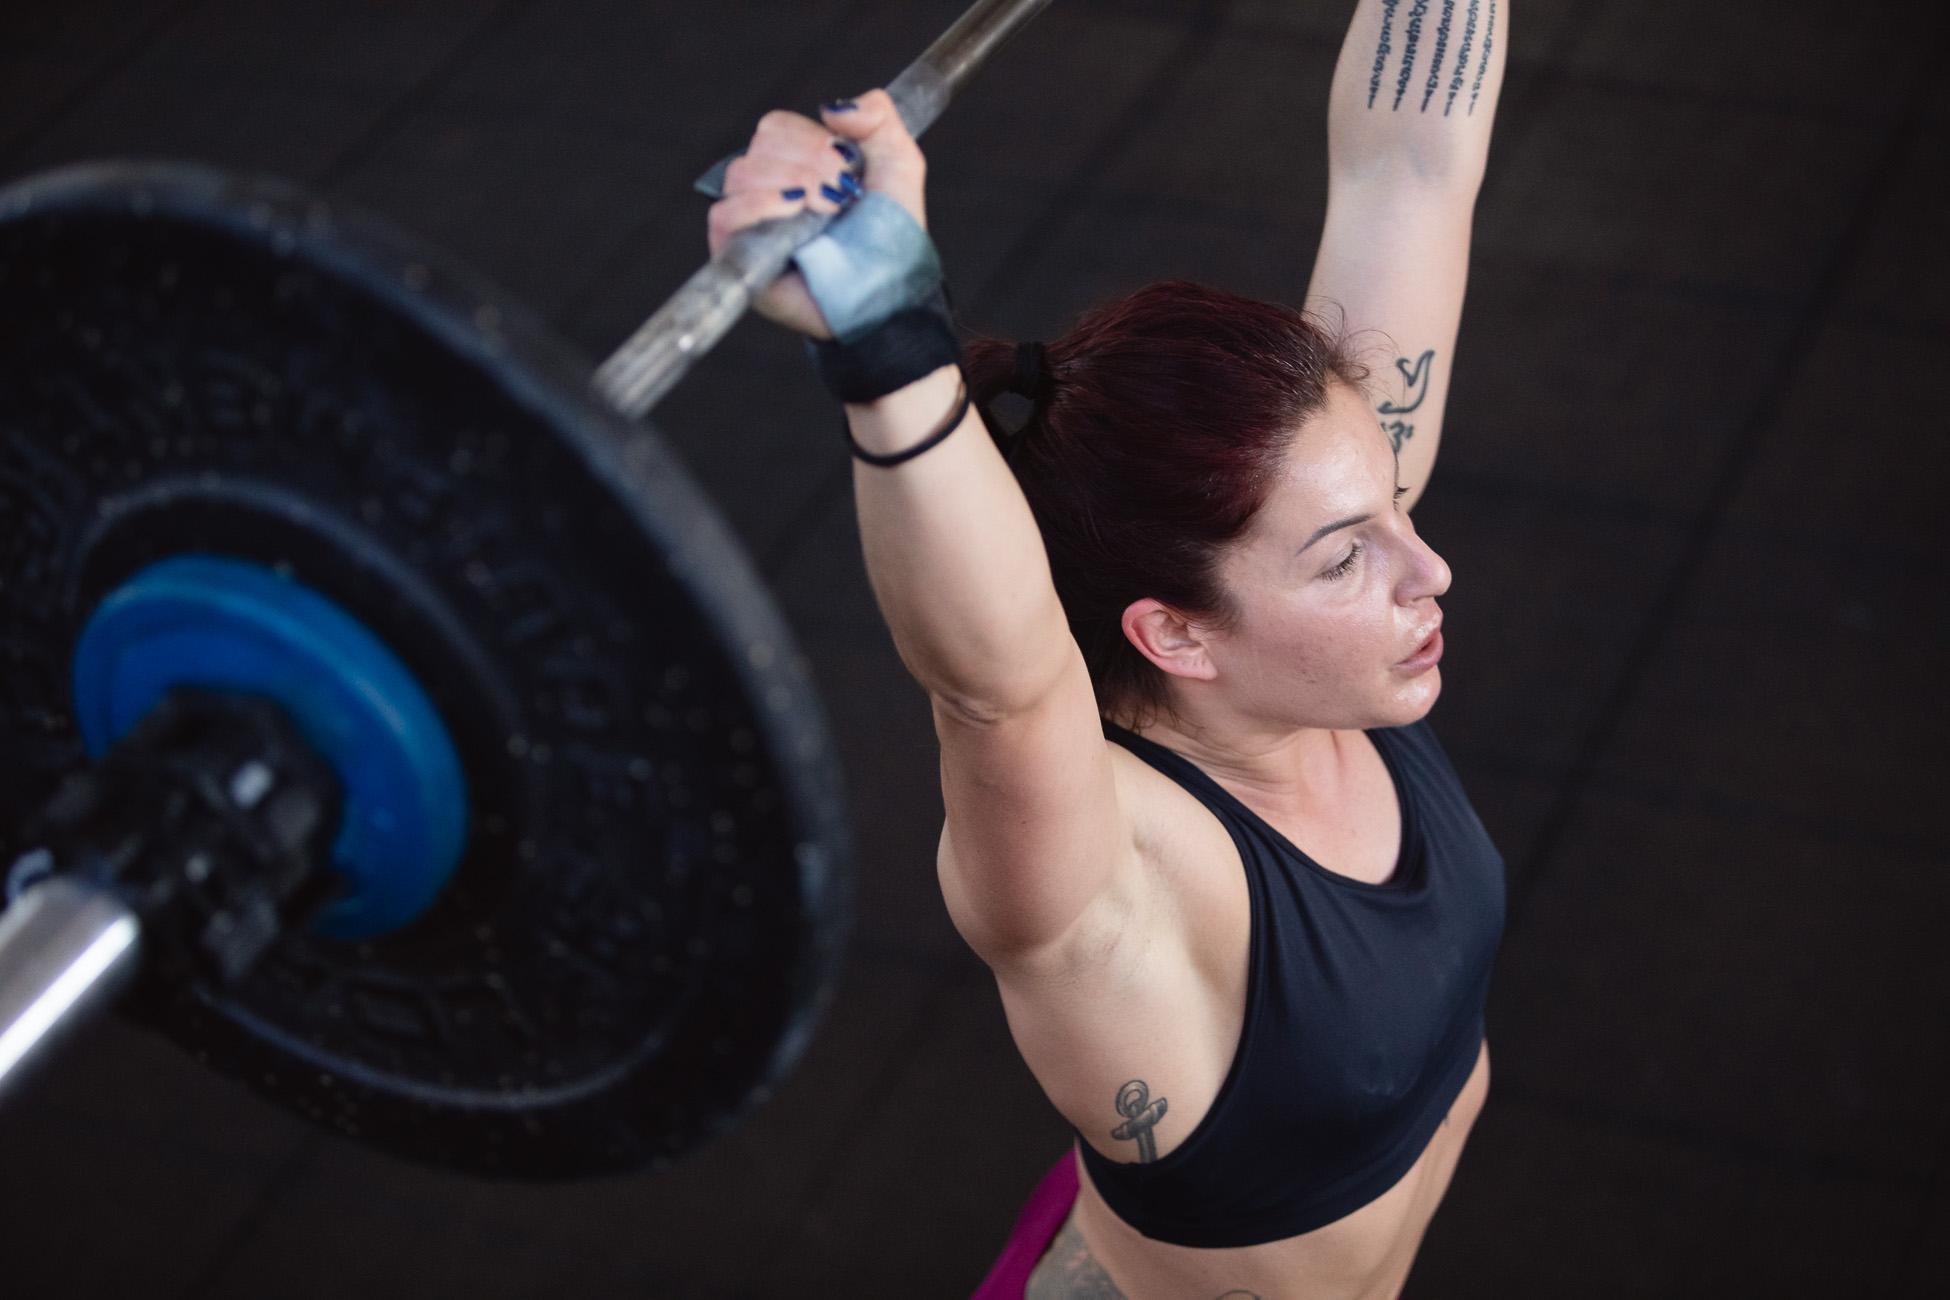 crossfit-games-open-fitness-lifestyle-desporto-atleta-fotografia-007.jpg